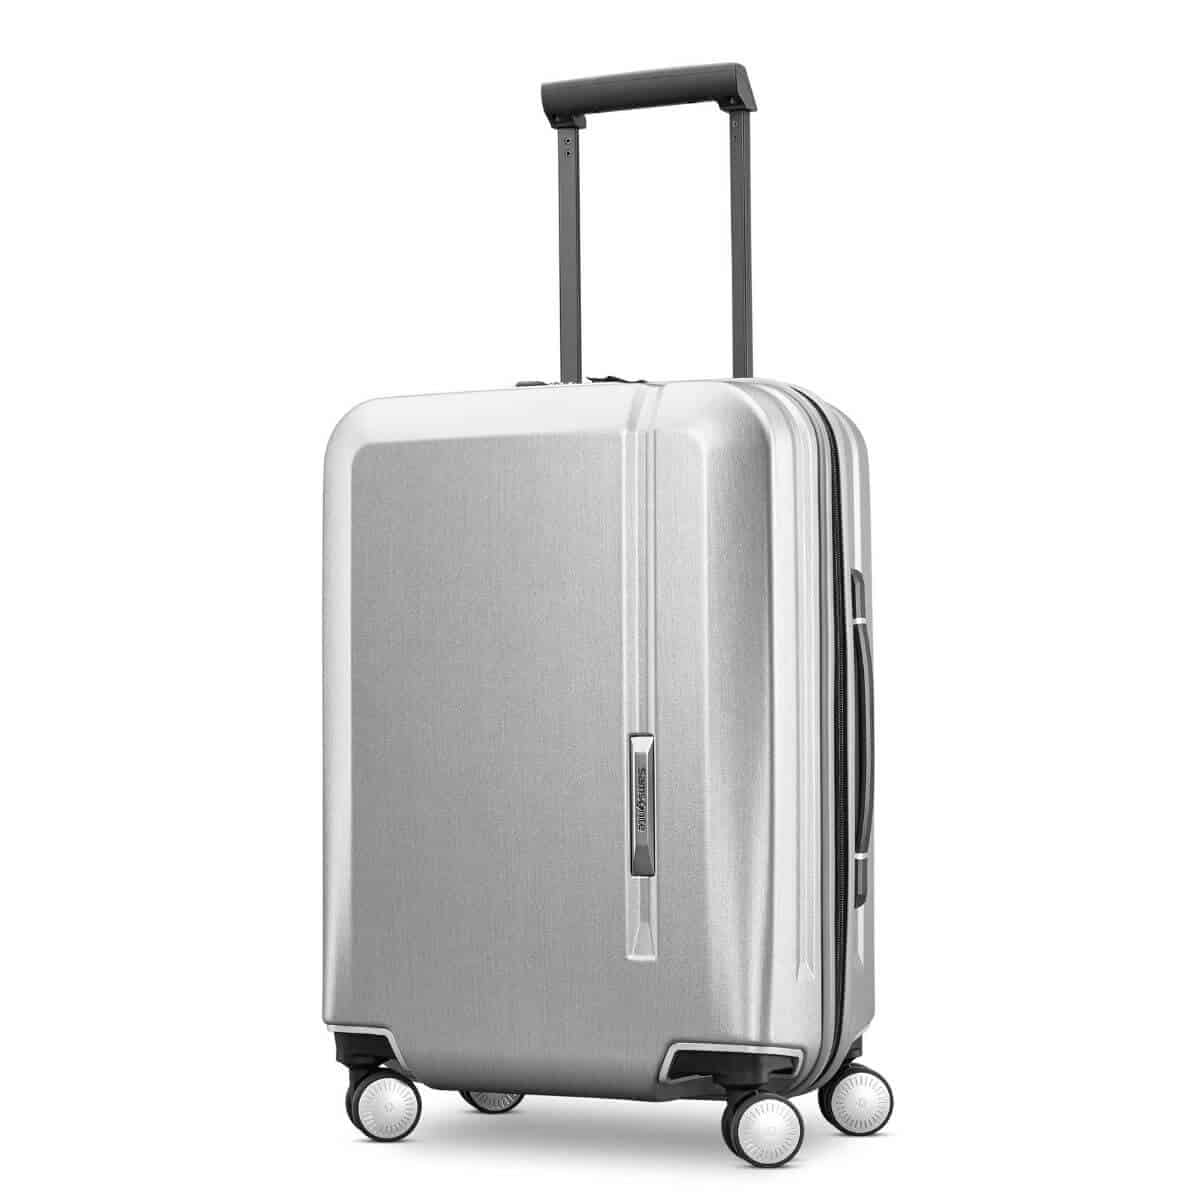 Silver hard-shell luggage by Samsonite.